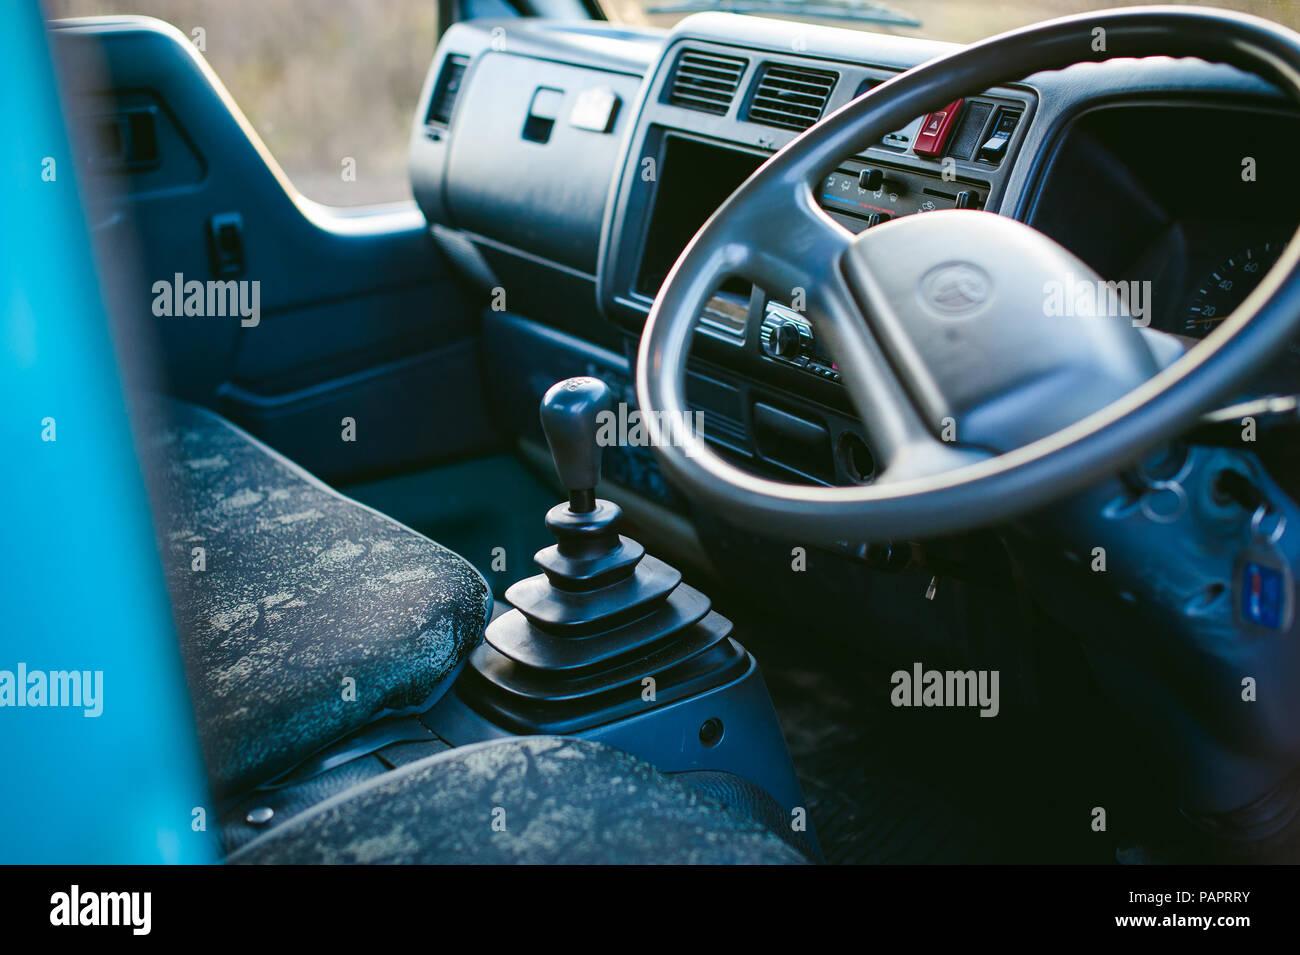 Semi Truck Interior Stock Photos & Semi Truck Interior Stock